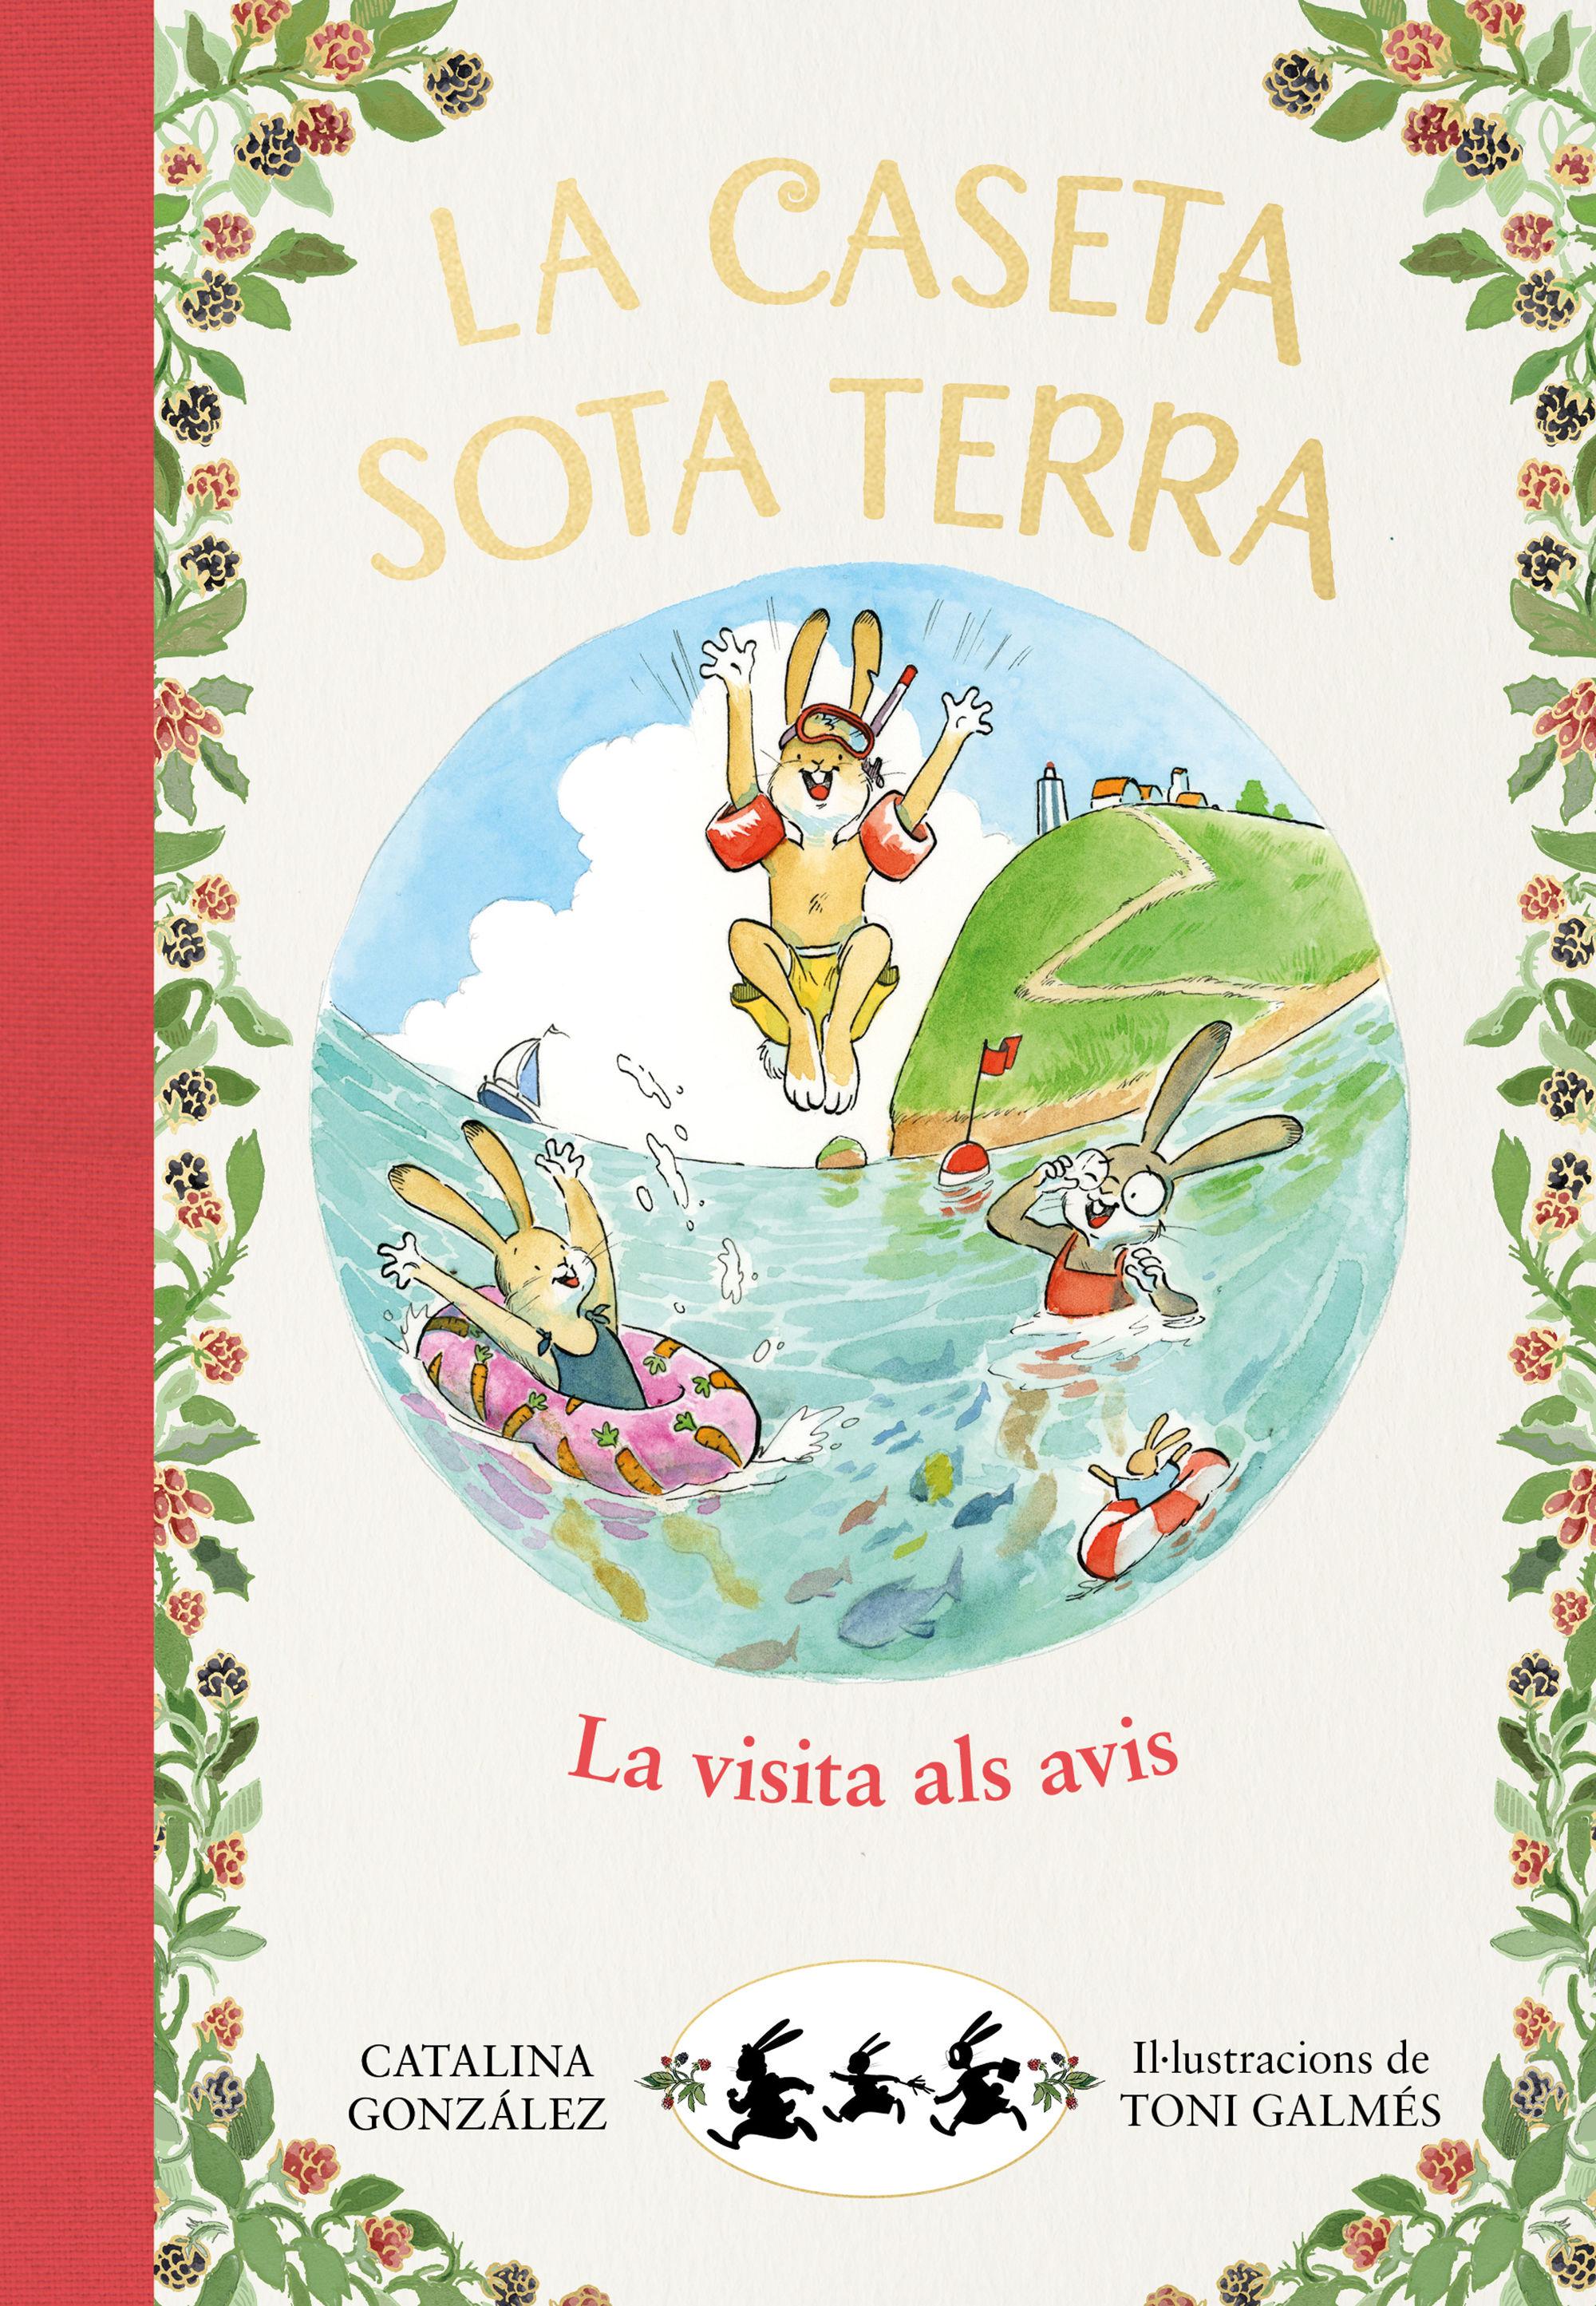 CASETA SOTA TERRA 4 LA VISITA ALS AVIS